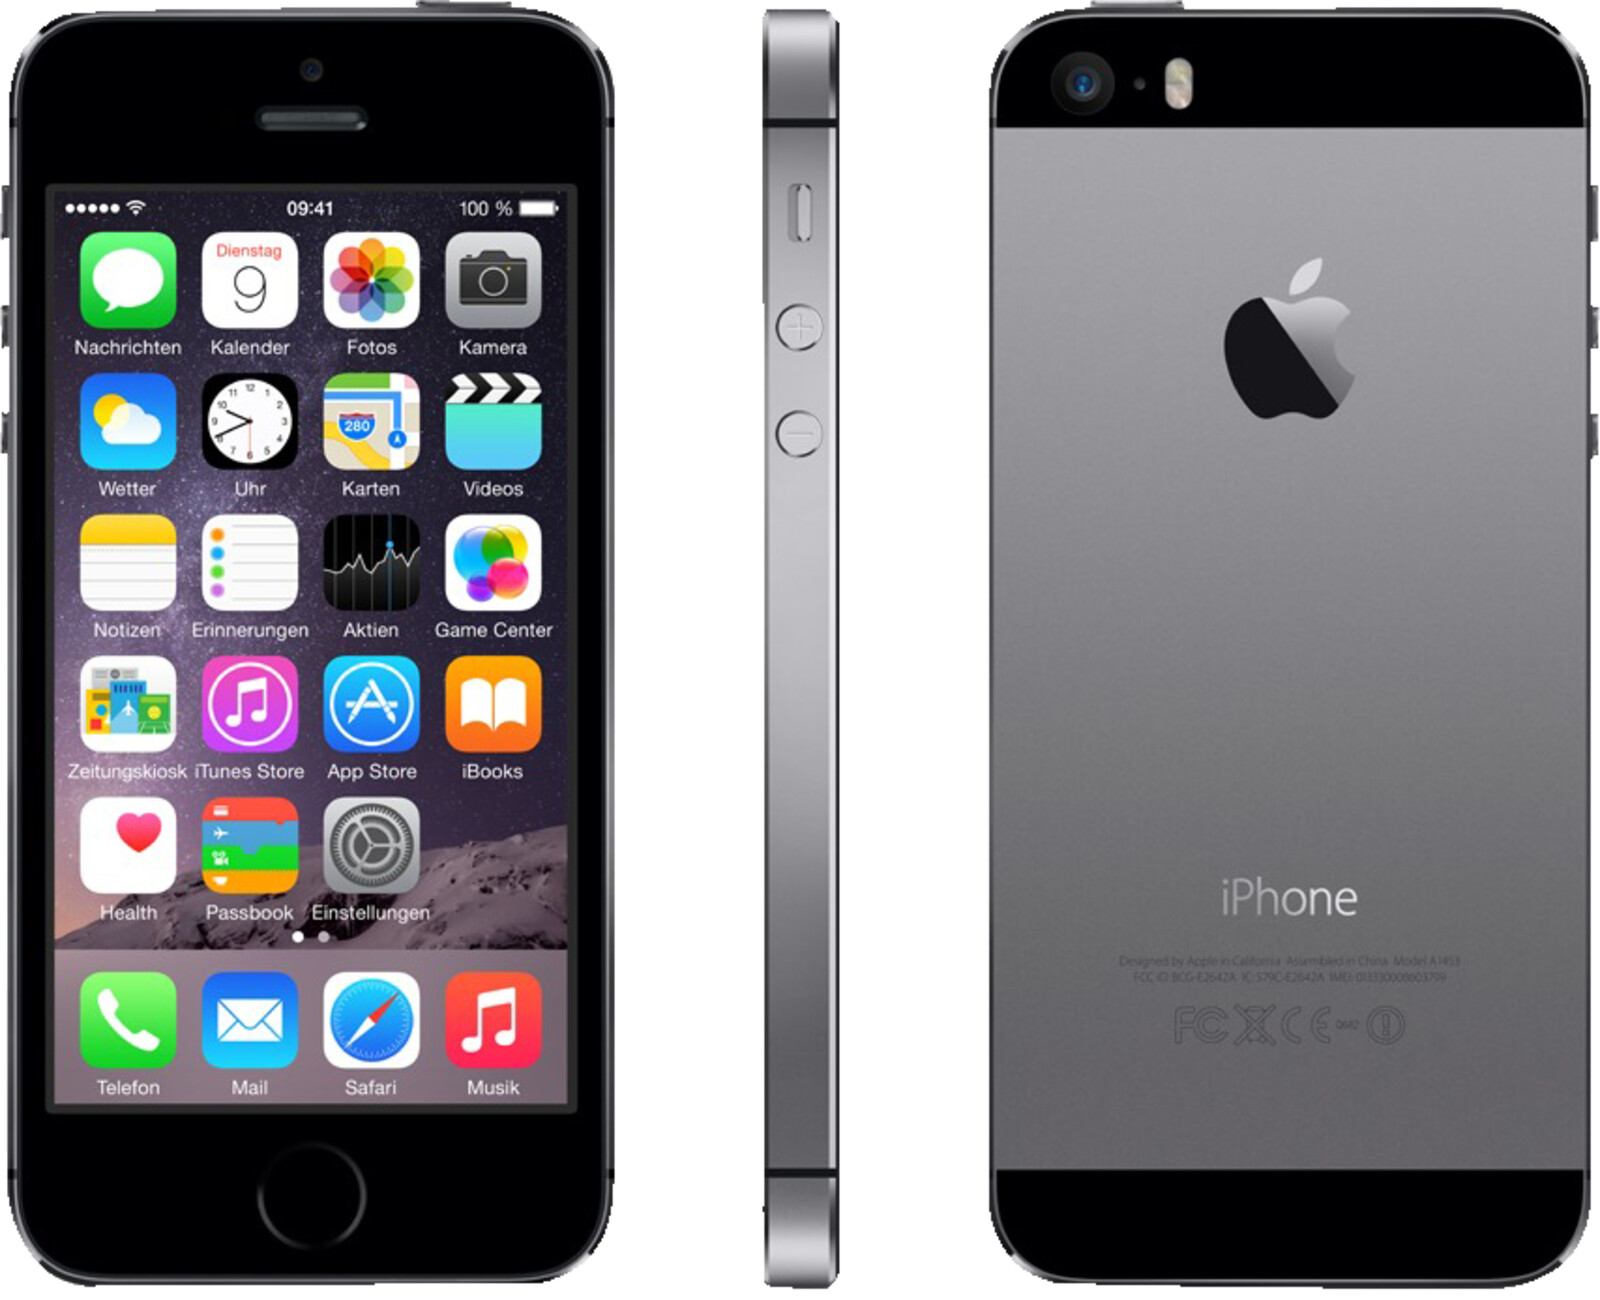 apple iphone 5s smartphone 16 gb 4 zoll grau lte. Black Bedroom Furniture Sets. Home Design Ideas